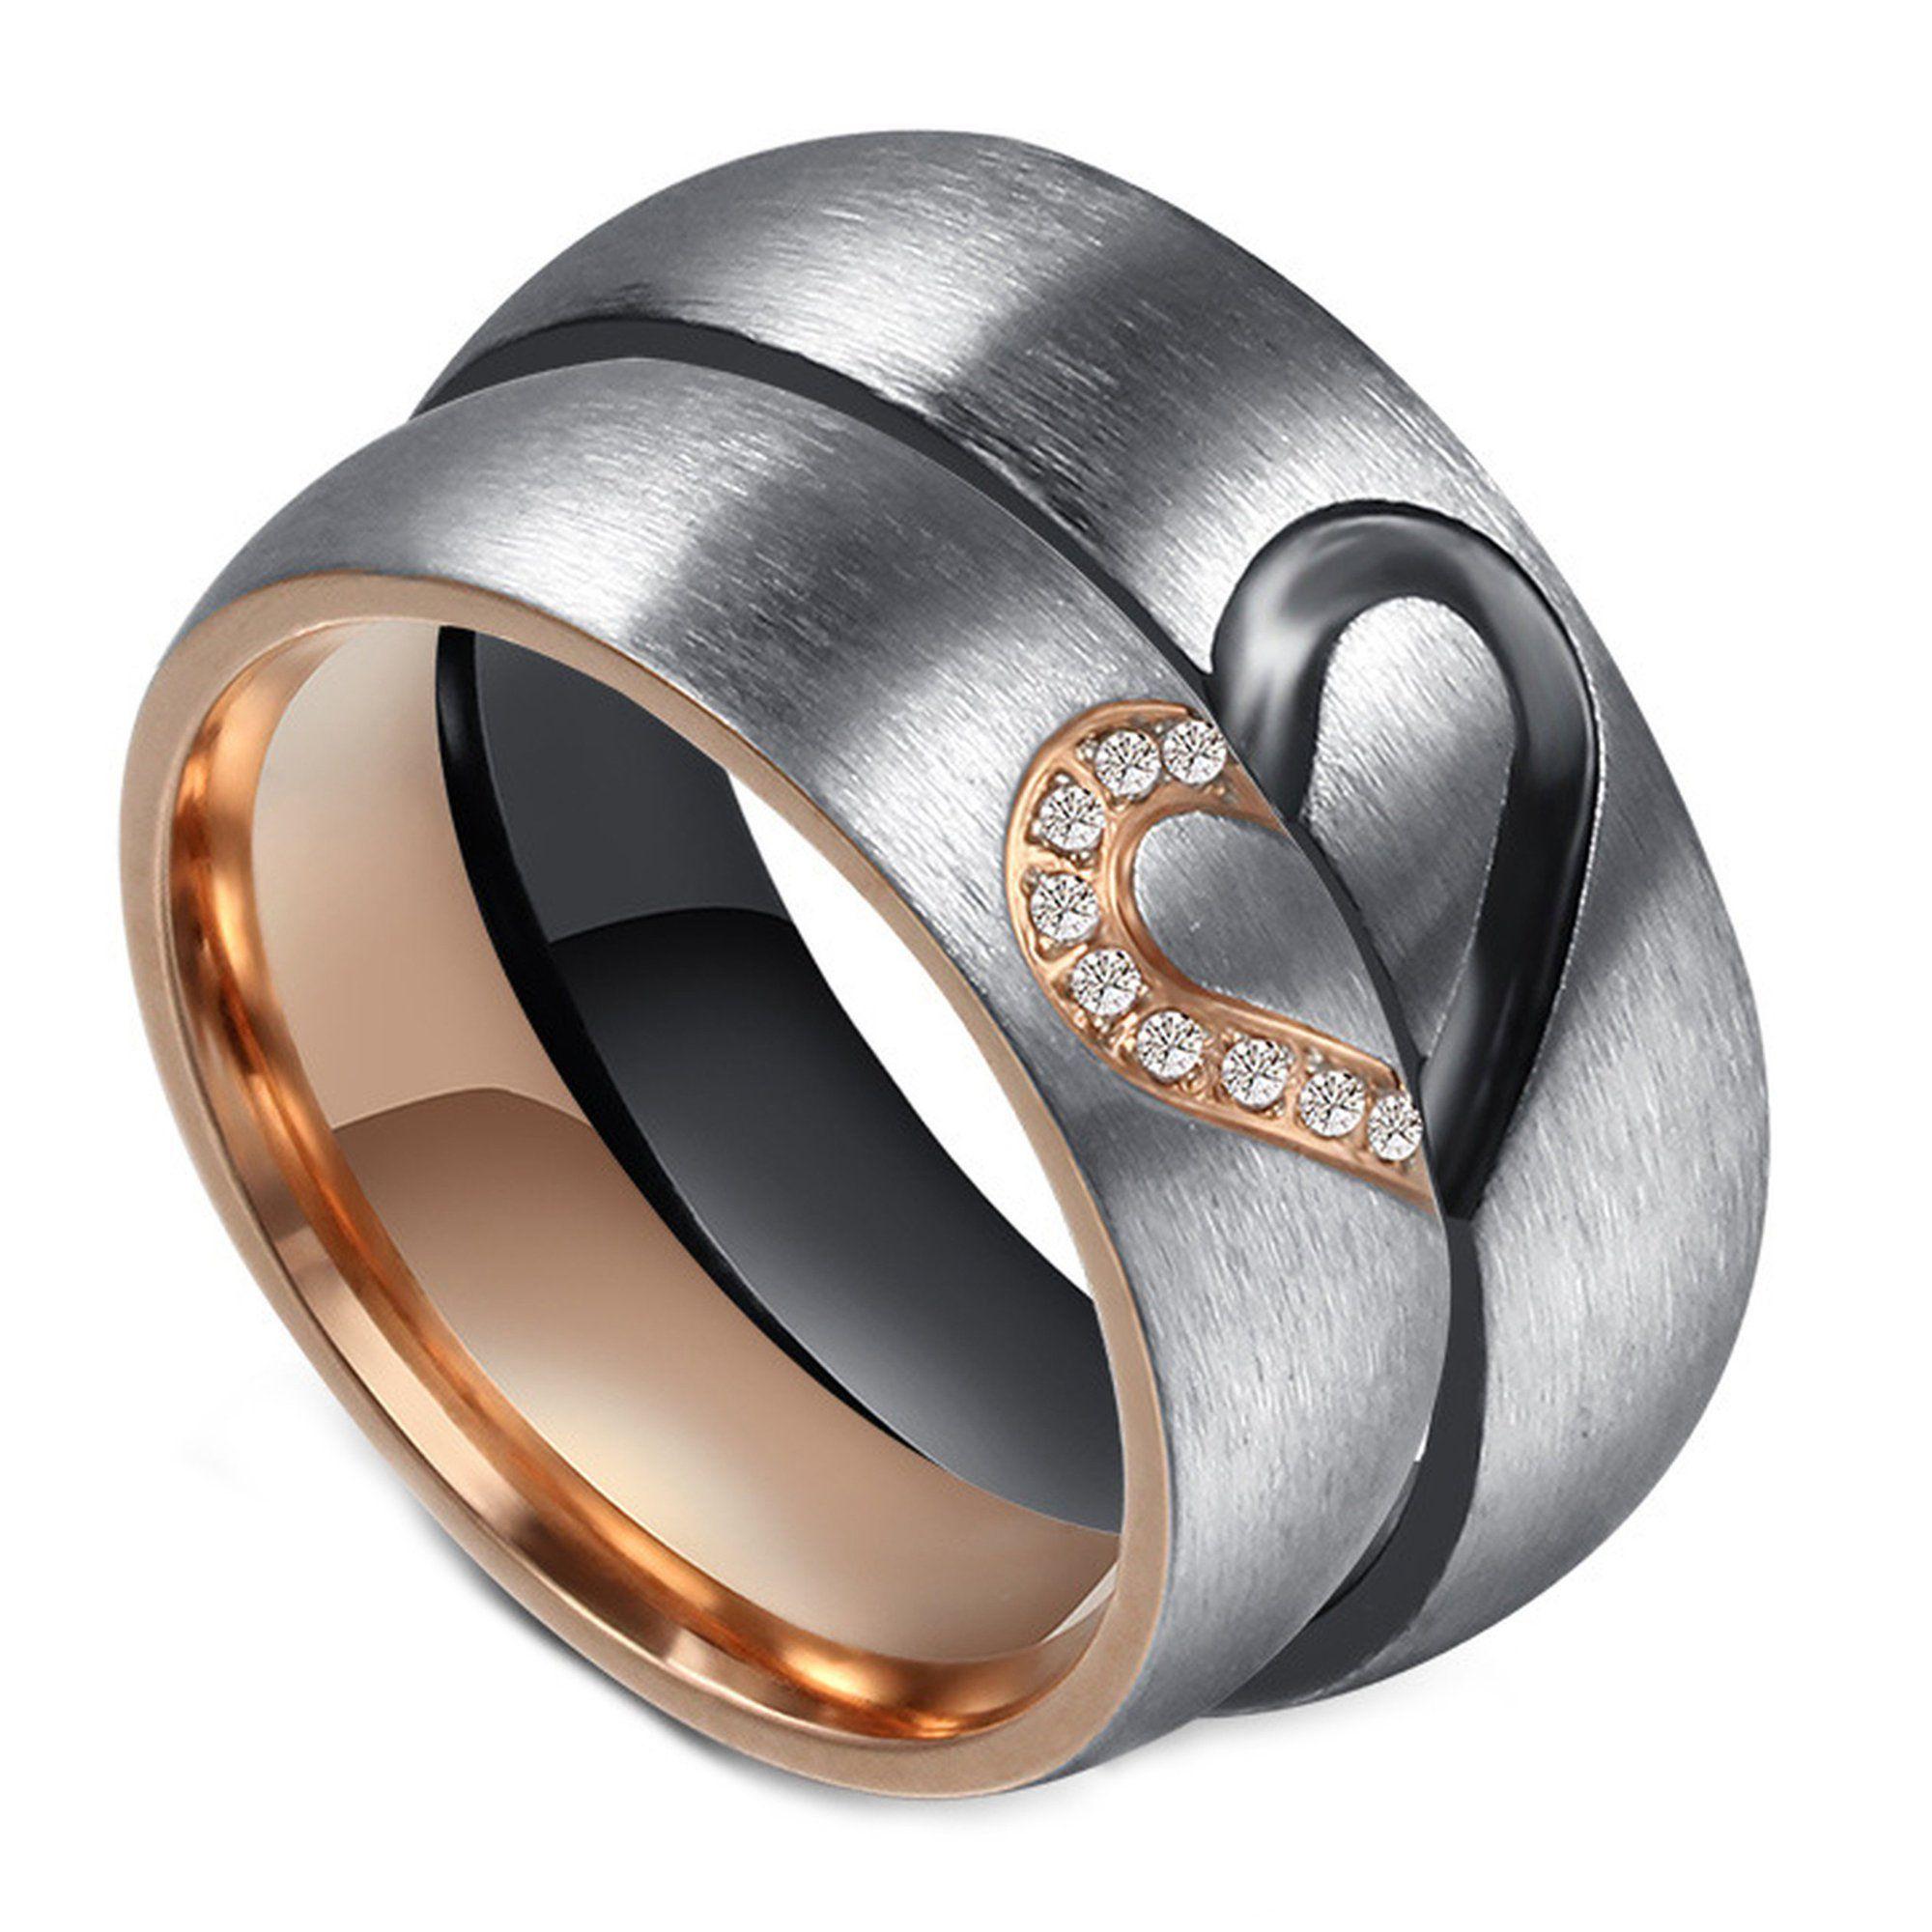 Wedding Ring Walmart Jewelry Titanium Rings For Men Titanium Wedding Rings Mens Wedding Rings